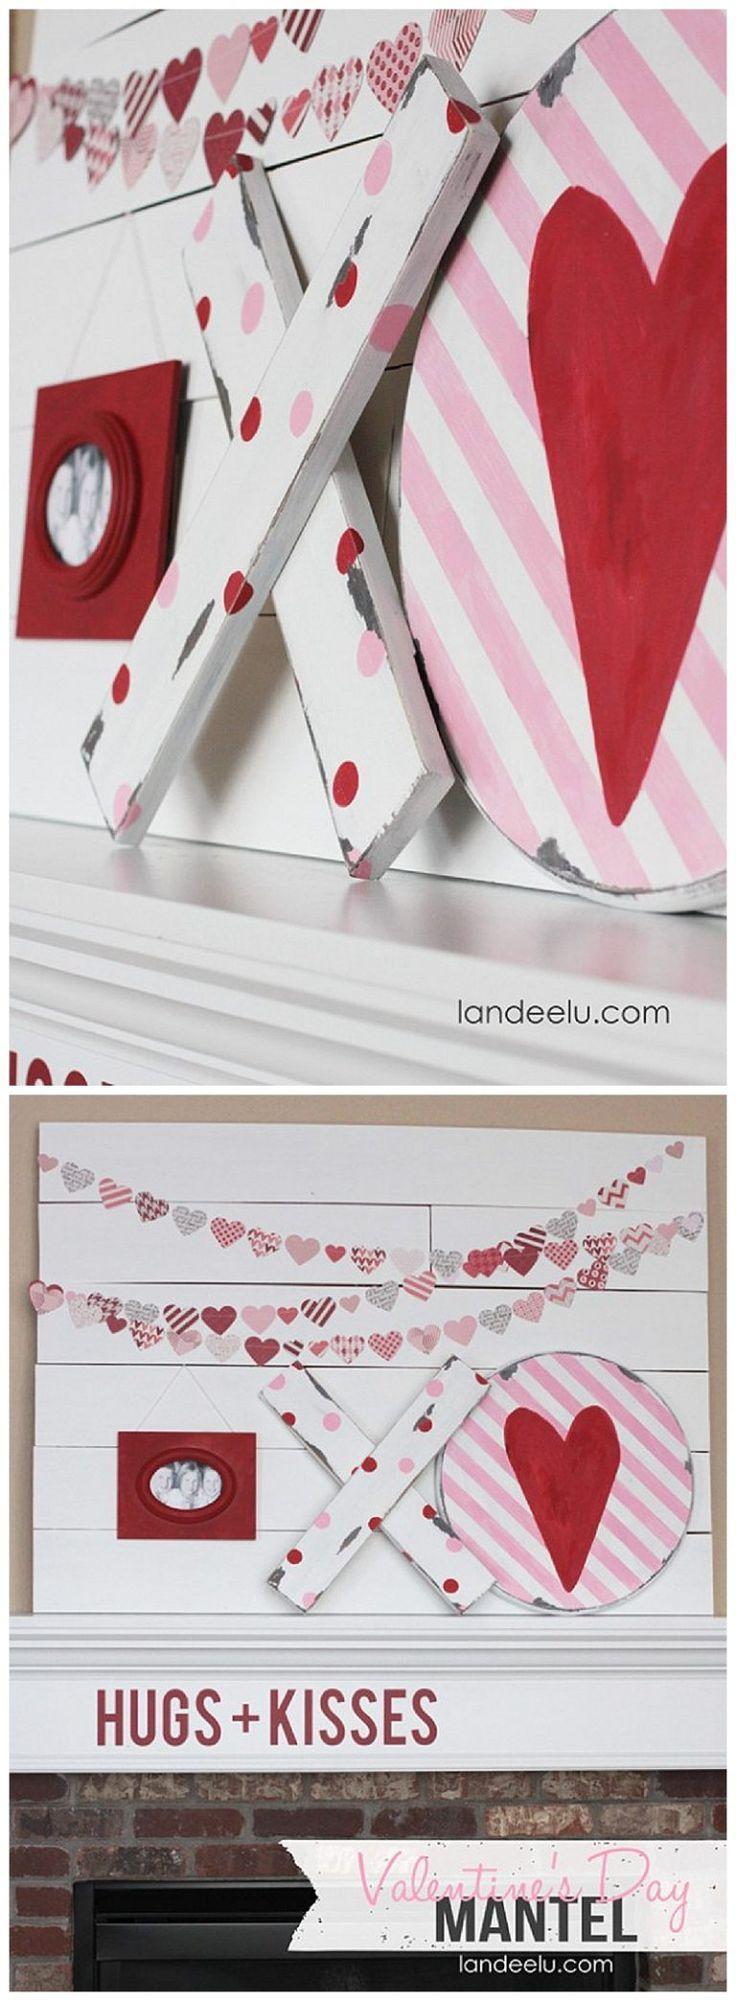 Valentine's Day Mantel: Hugs & Kisses |  DIY: different colors